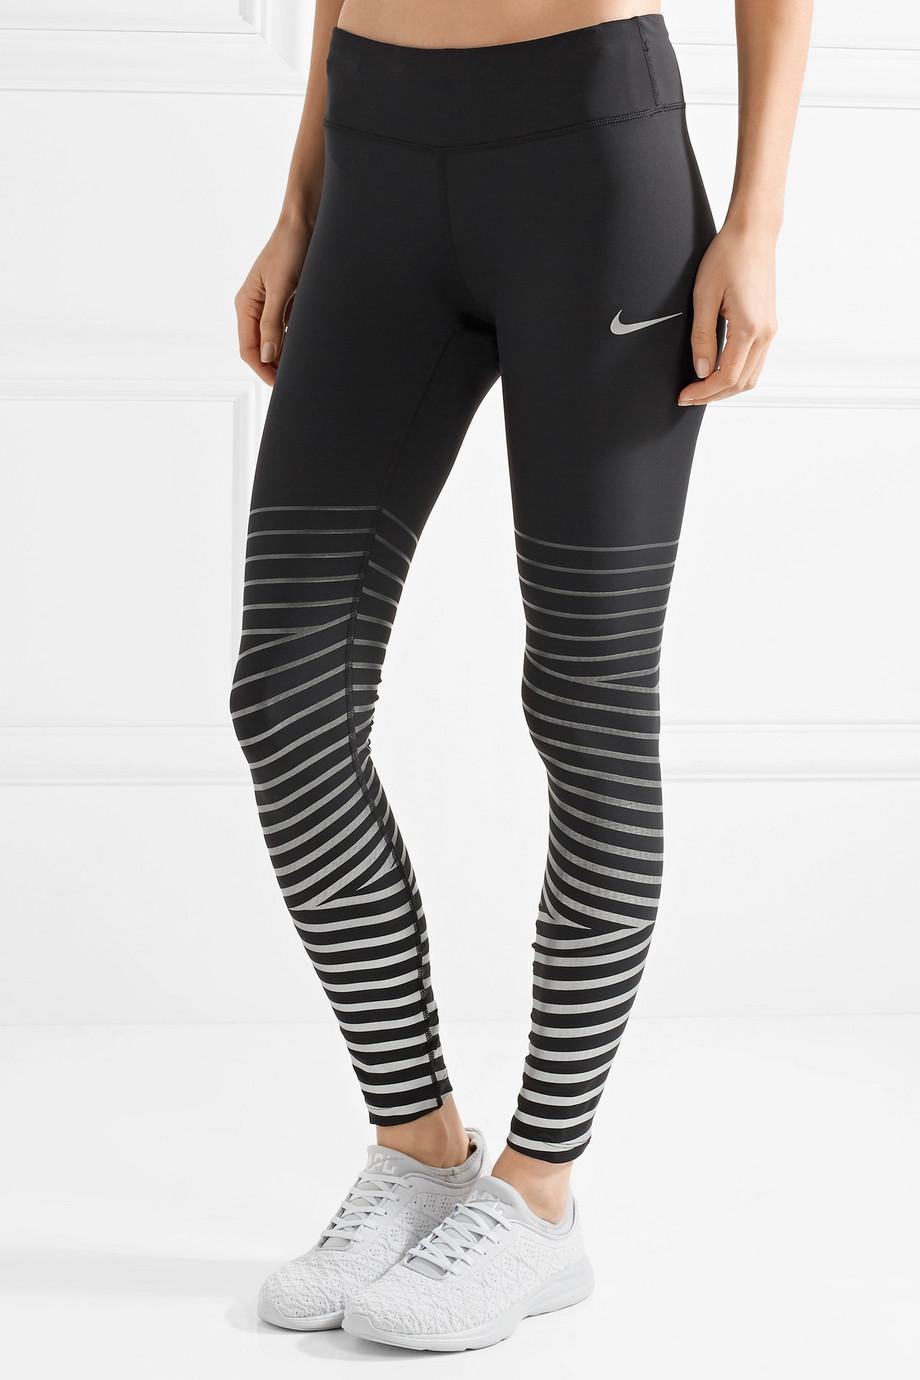 nike striped leggings